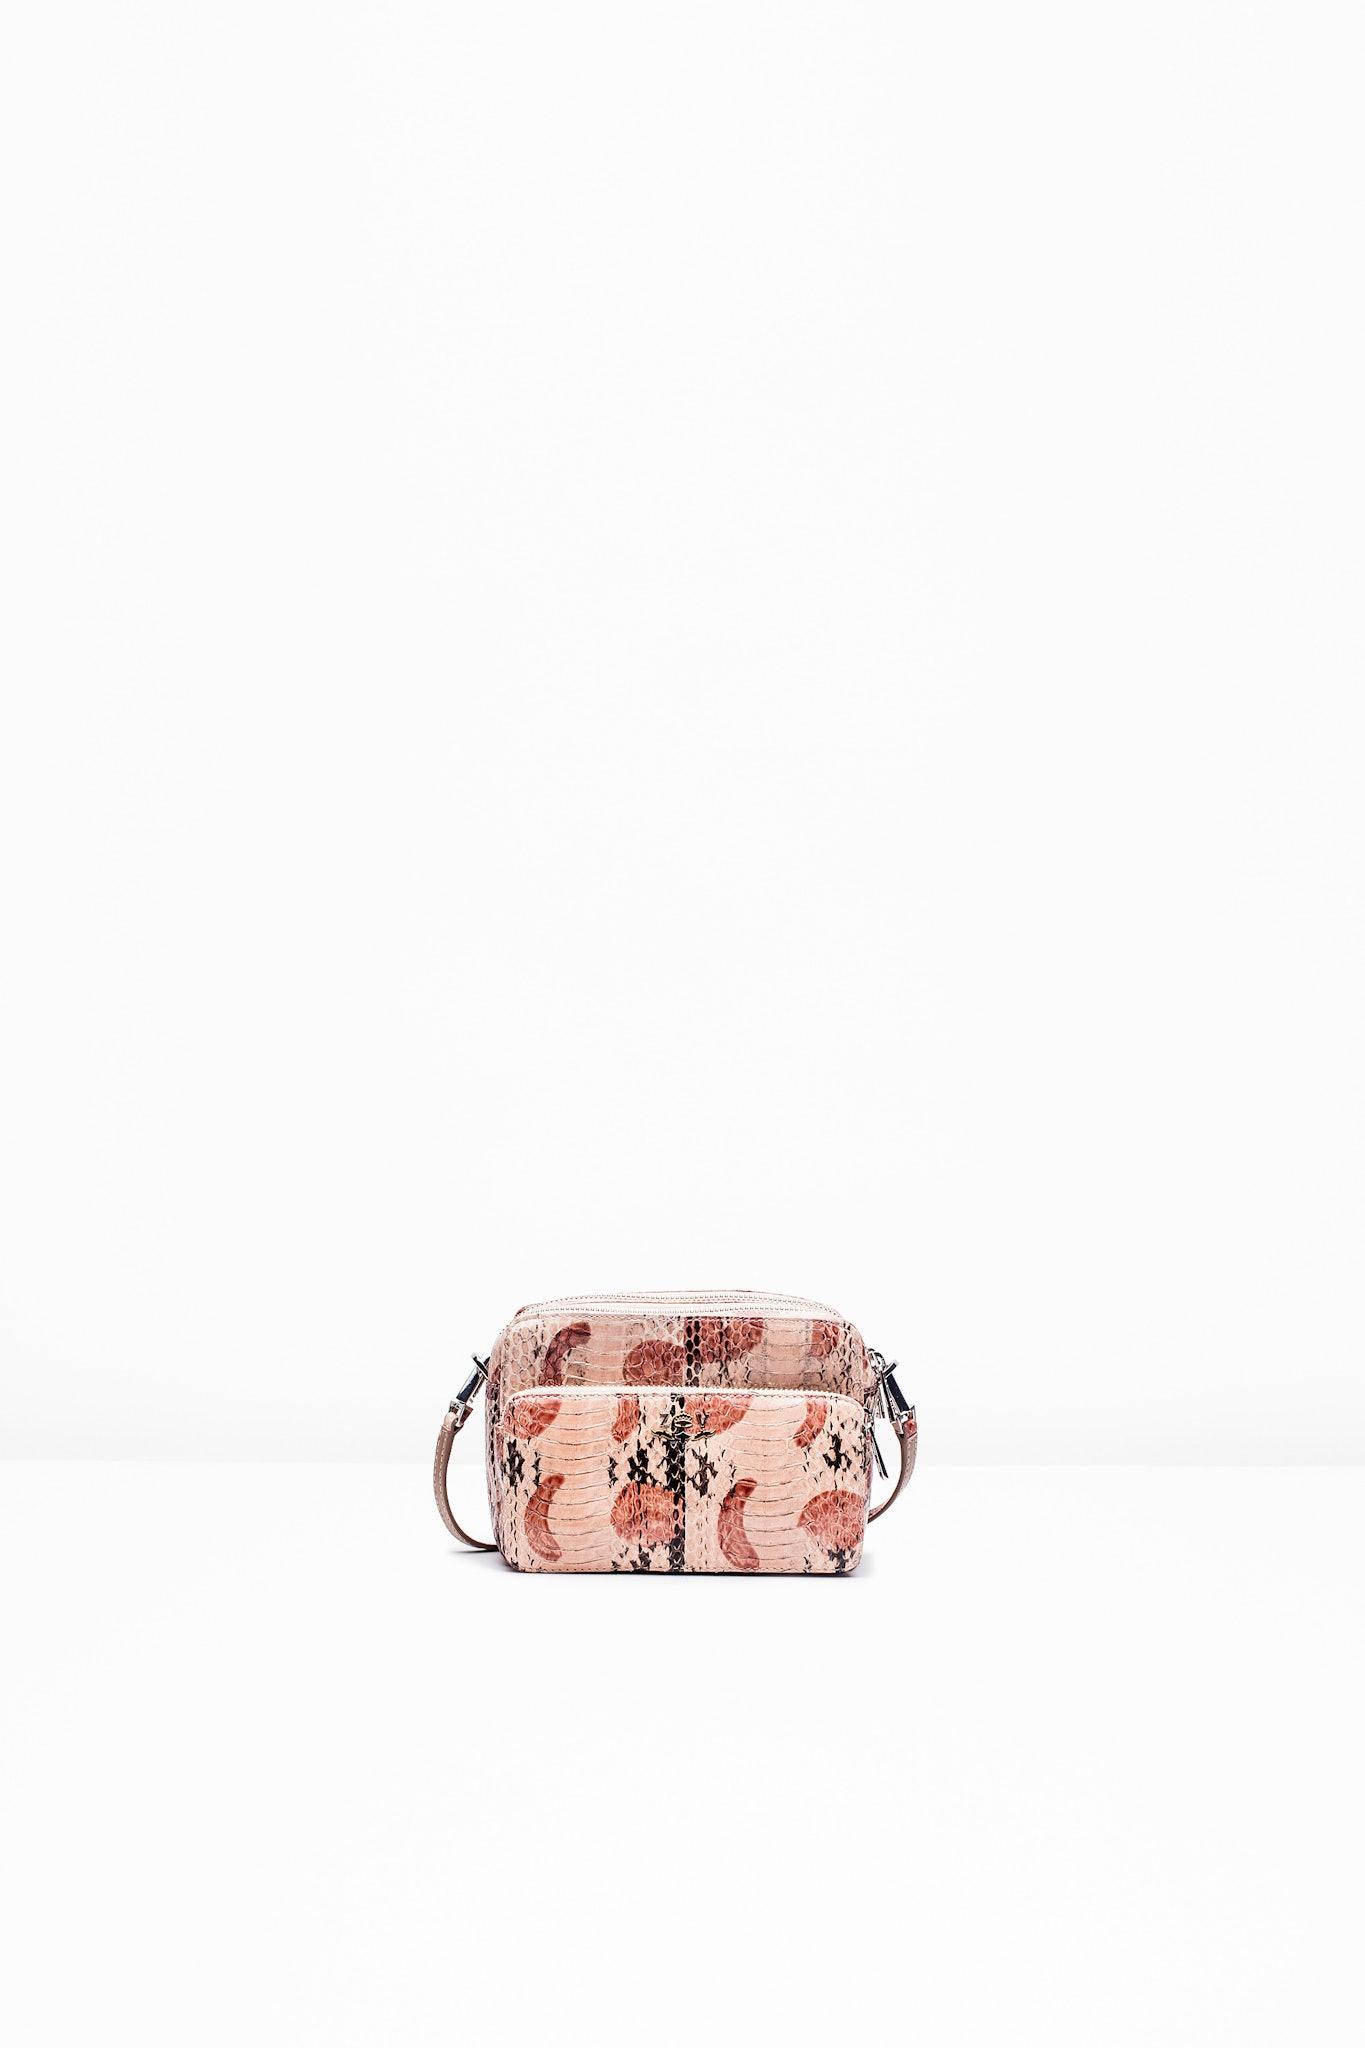 Boxy XL Python Bag